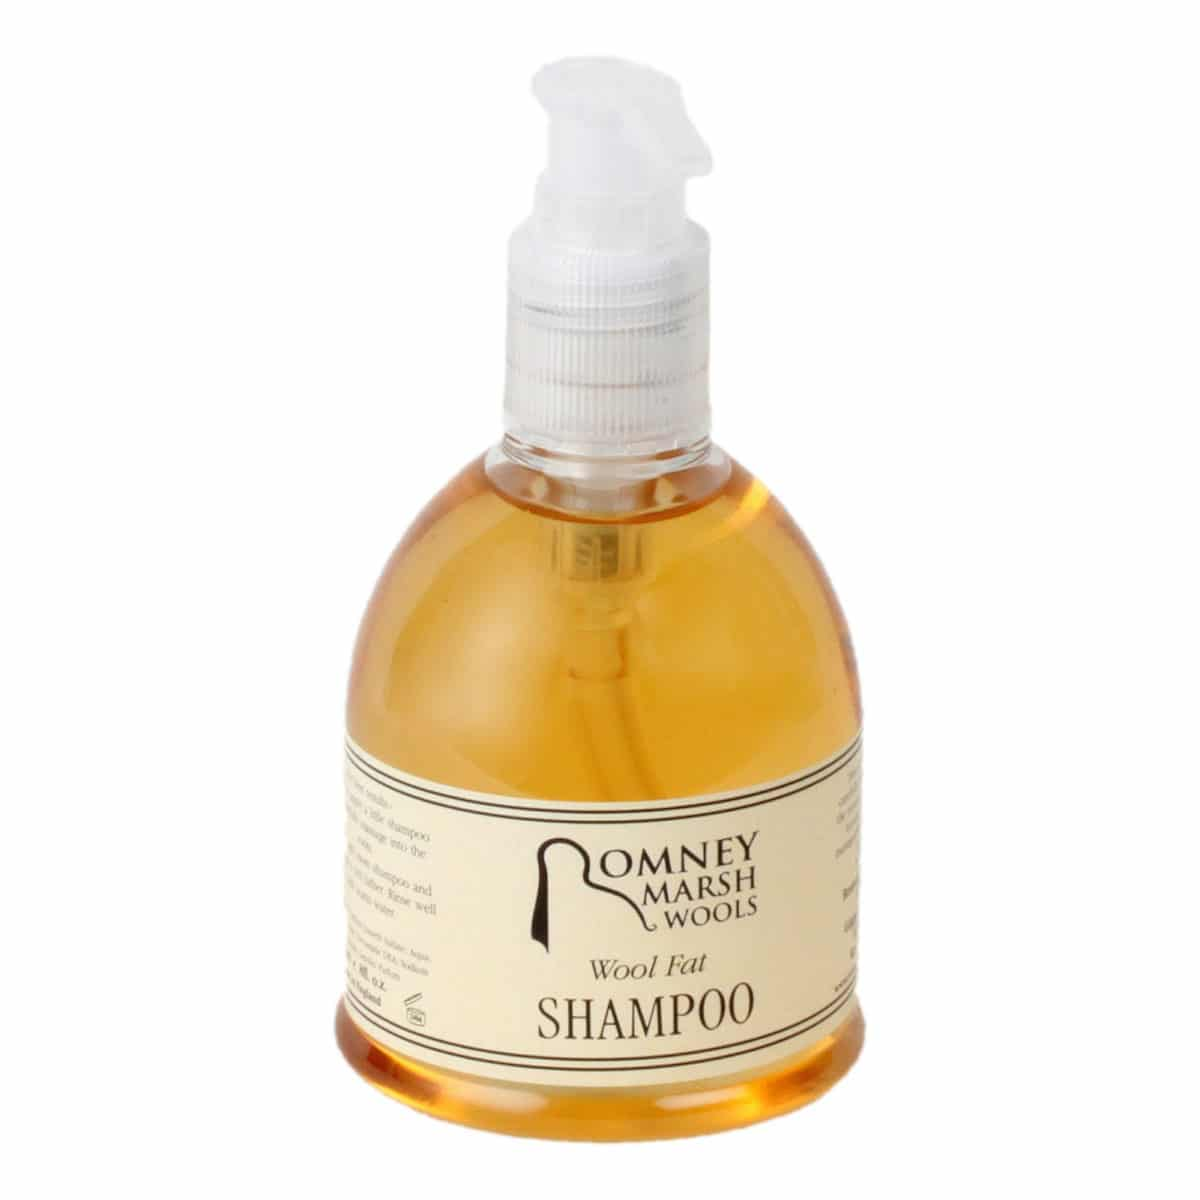 Luxury Romney Marsh Lanolin Shampoo 240ml